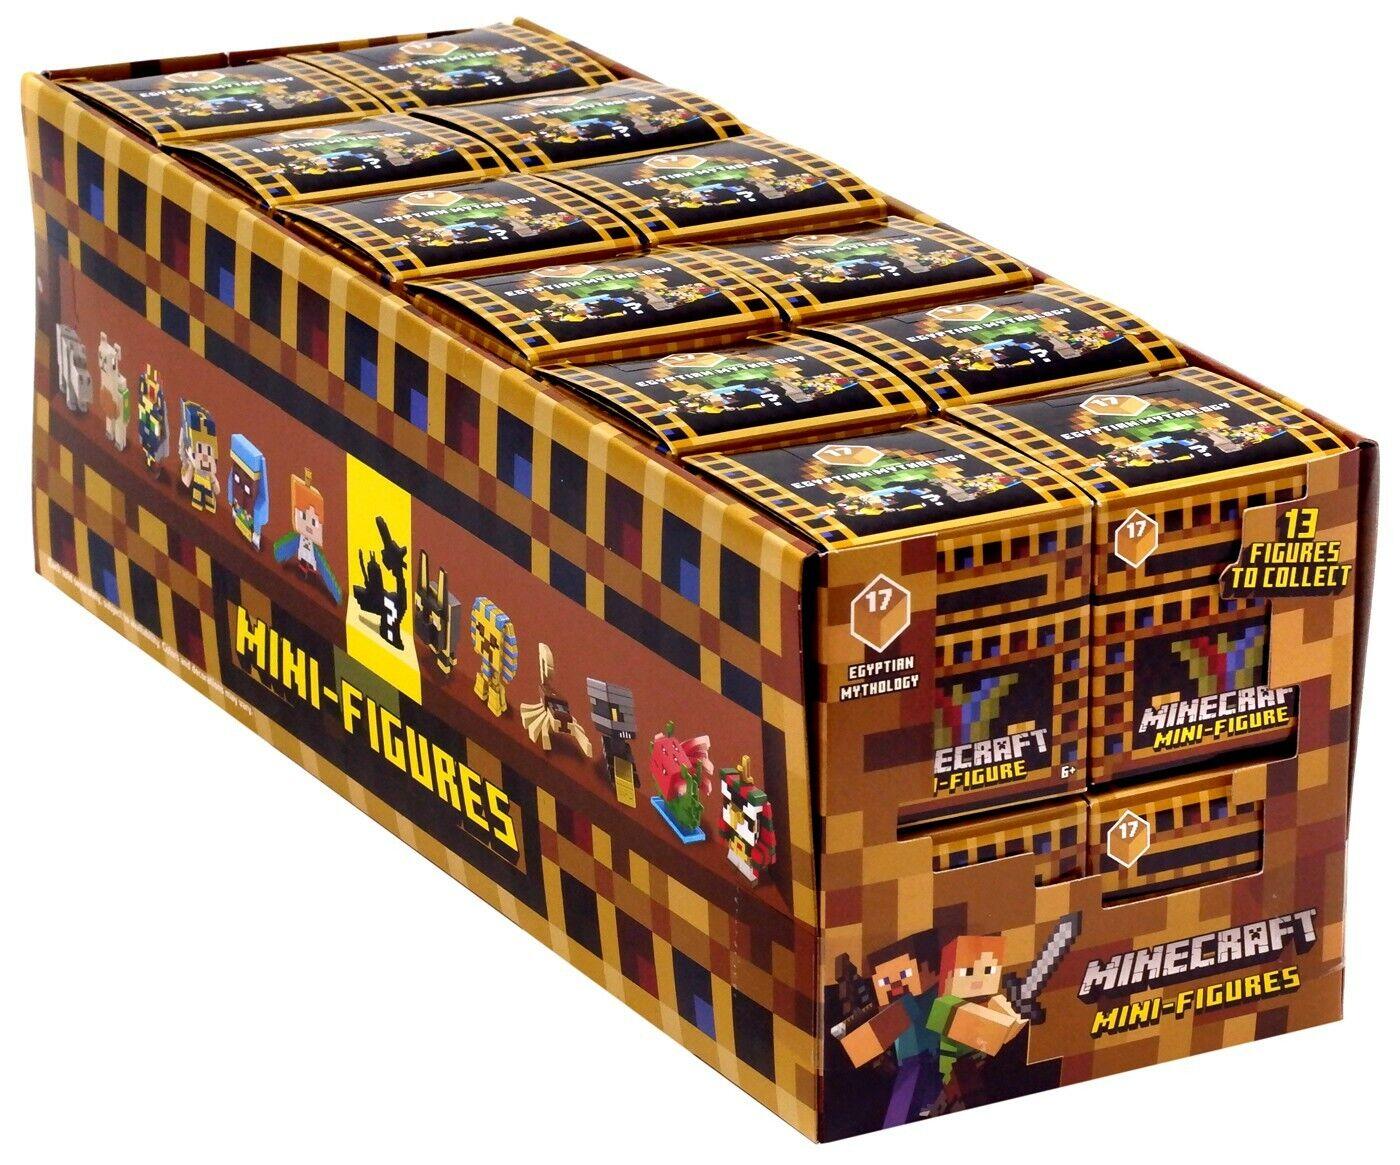 Minecraft Egyptian Mythology Series 17 Mystery Minis Blind Box